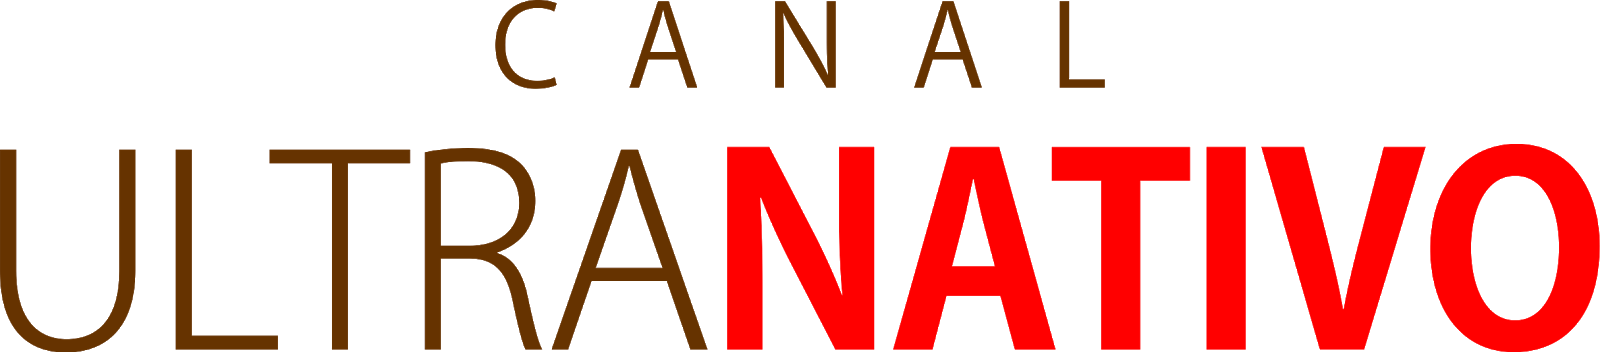 Canal Ultranativo